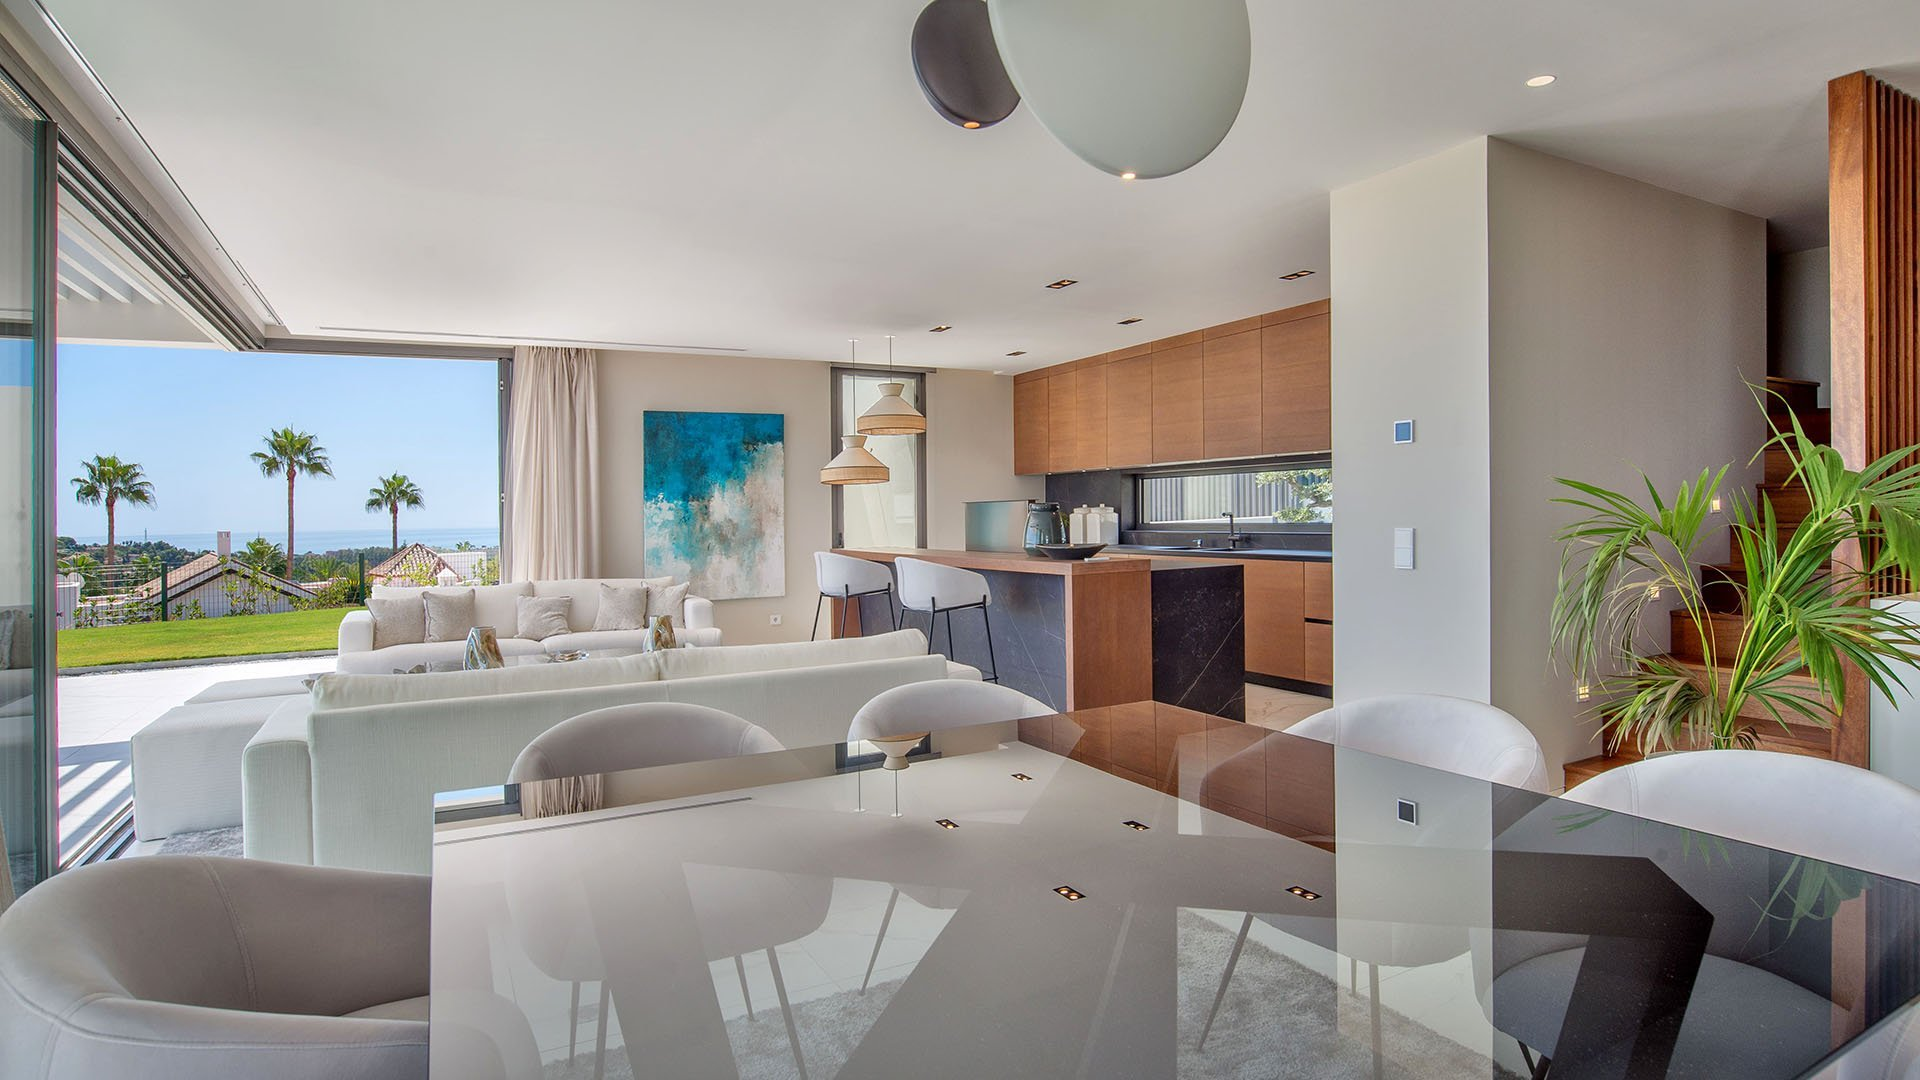 Mirador del Paraíso Infinity: Luxury duplex penthouses on the New Golden Mile